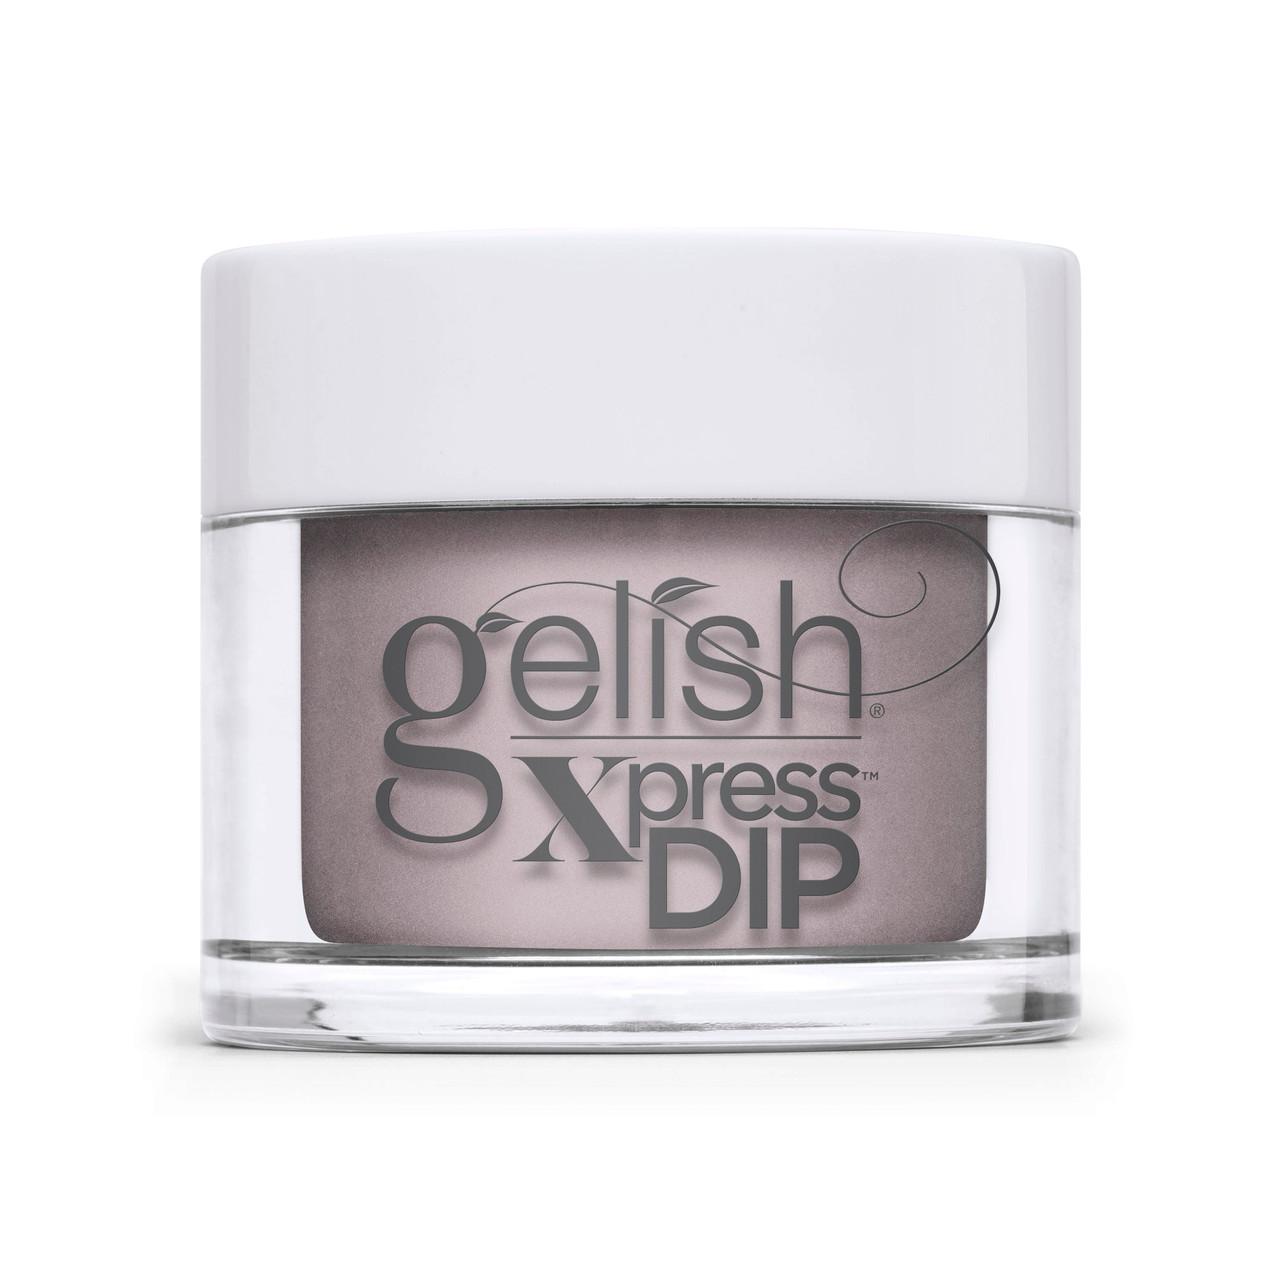 "Gelish Xpress Dip ""Keep 'Em Guessing"" - Taupe Crème - 43g | 1.5 oz."